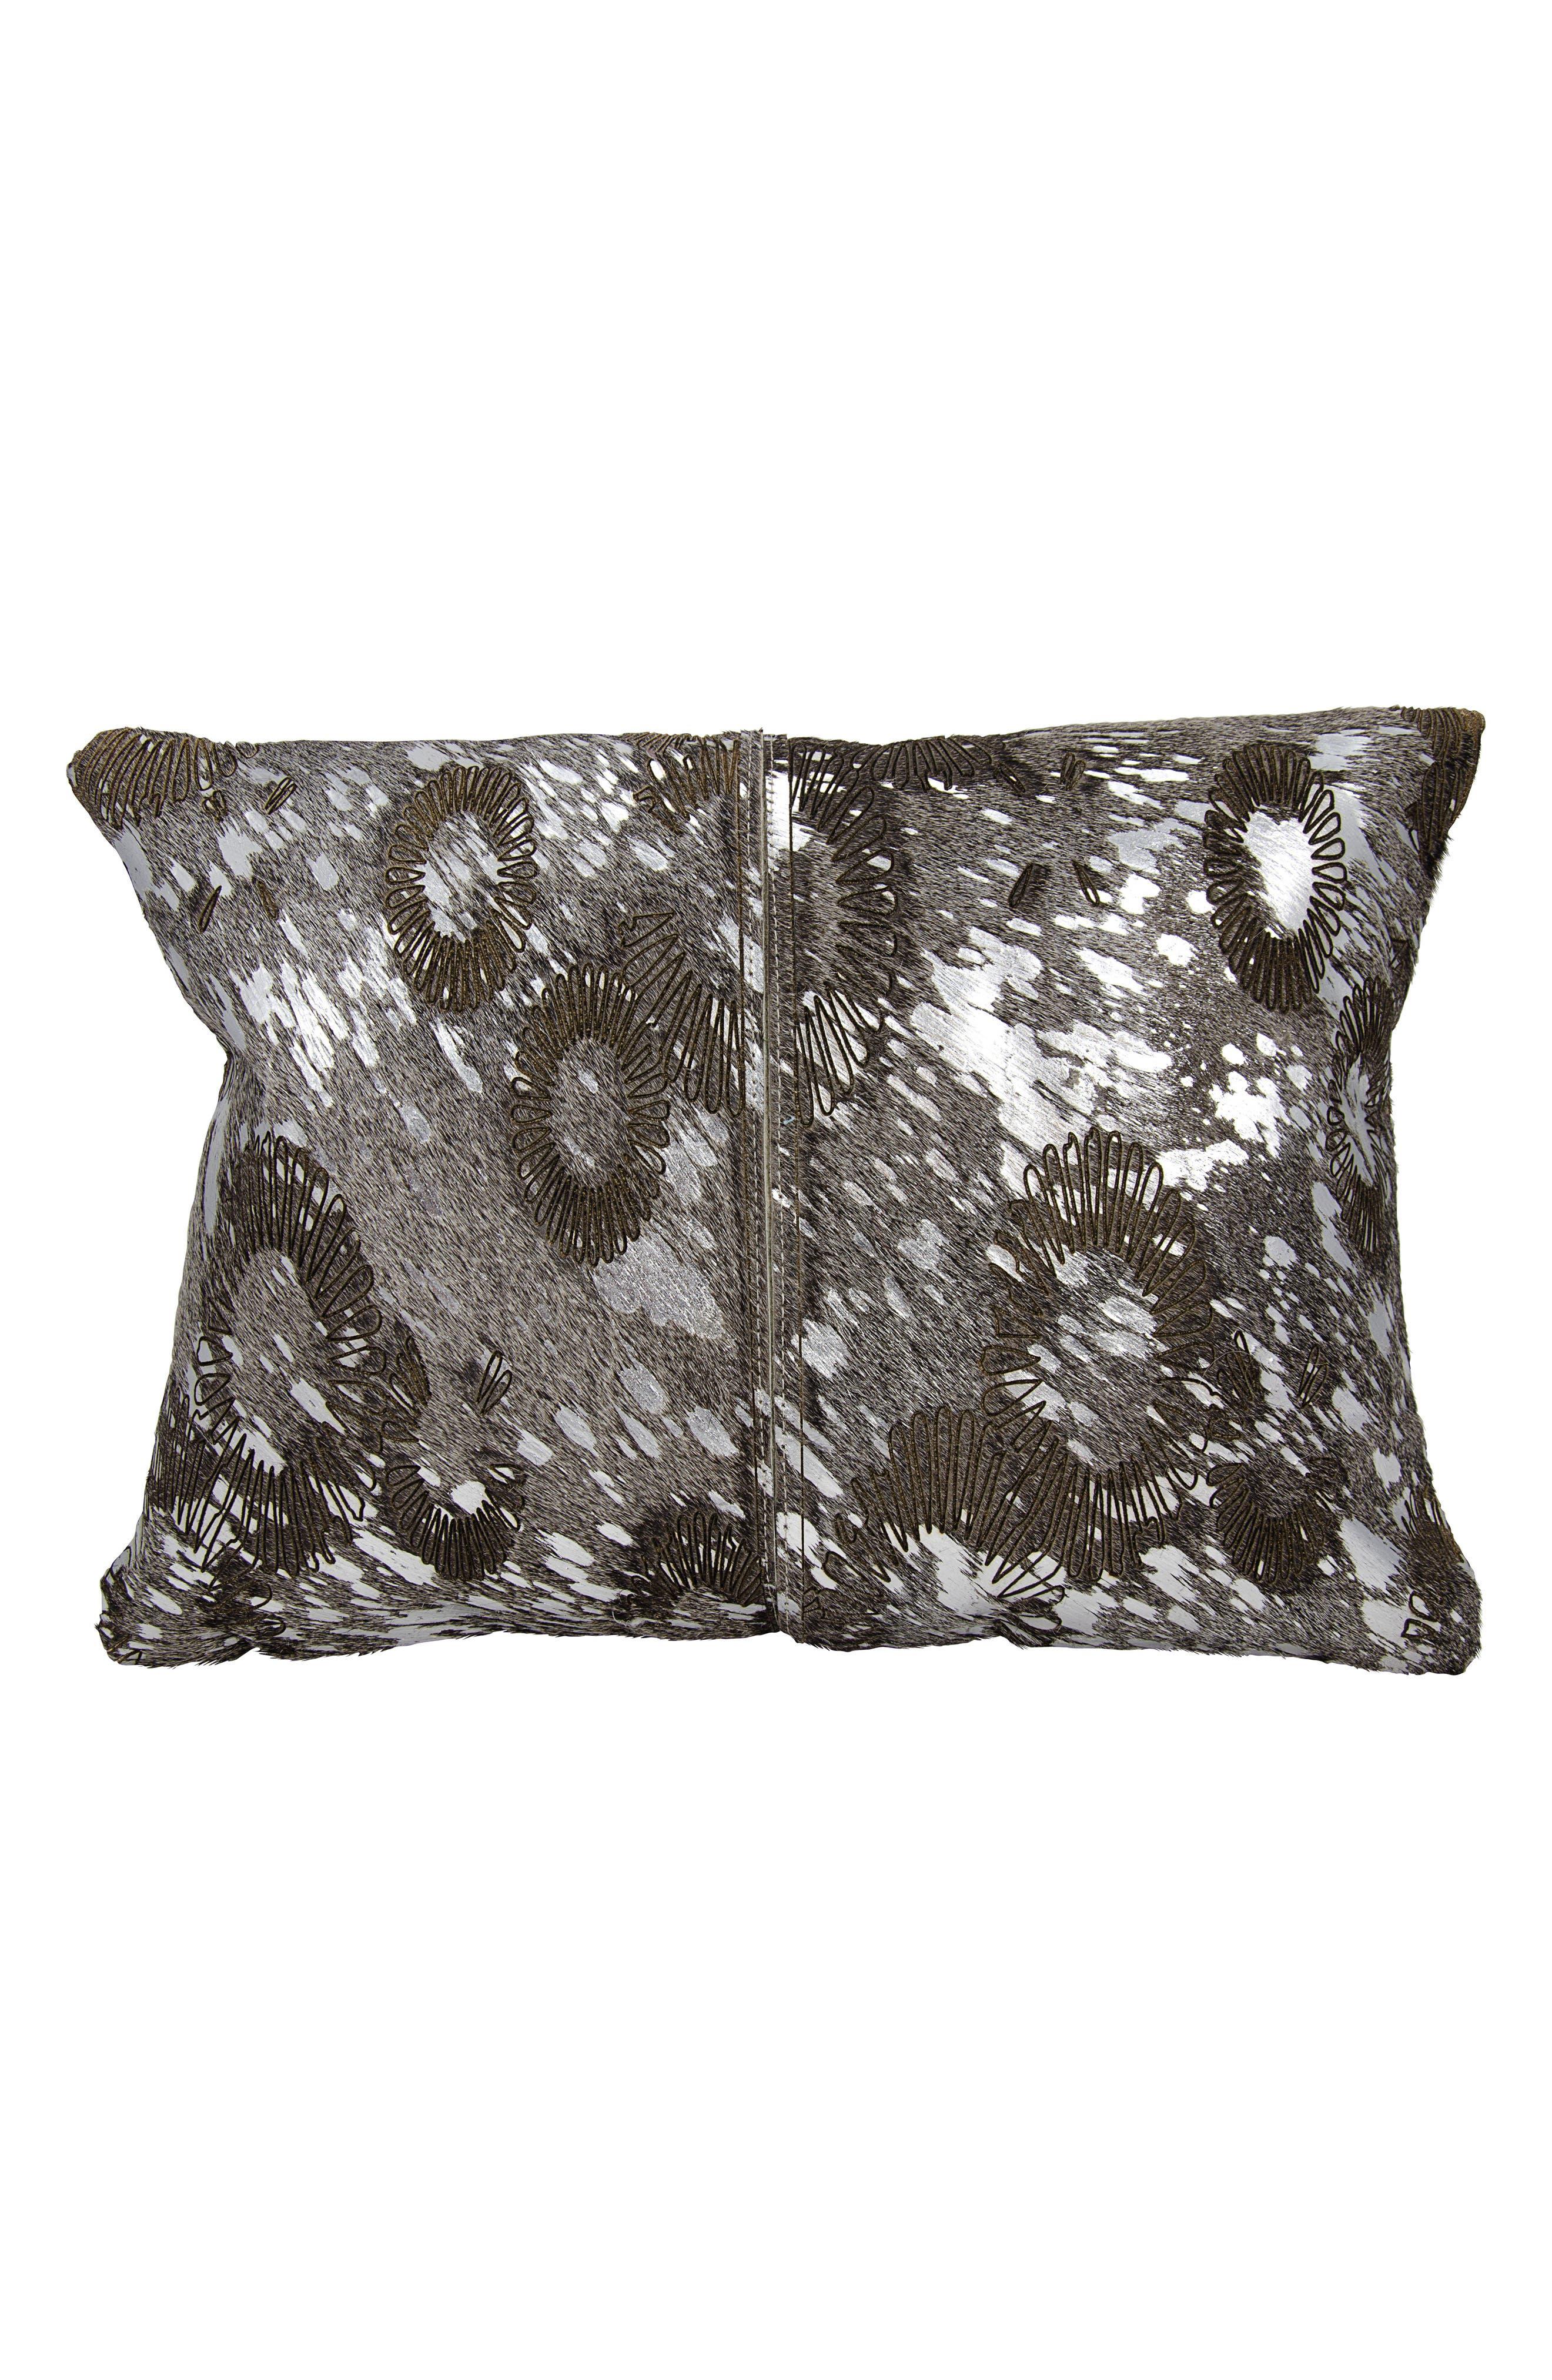 Mina Victory Metallic Calf Hair Accent Pillow